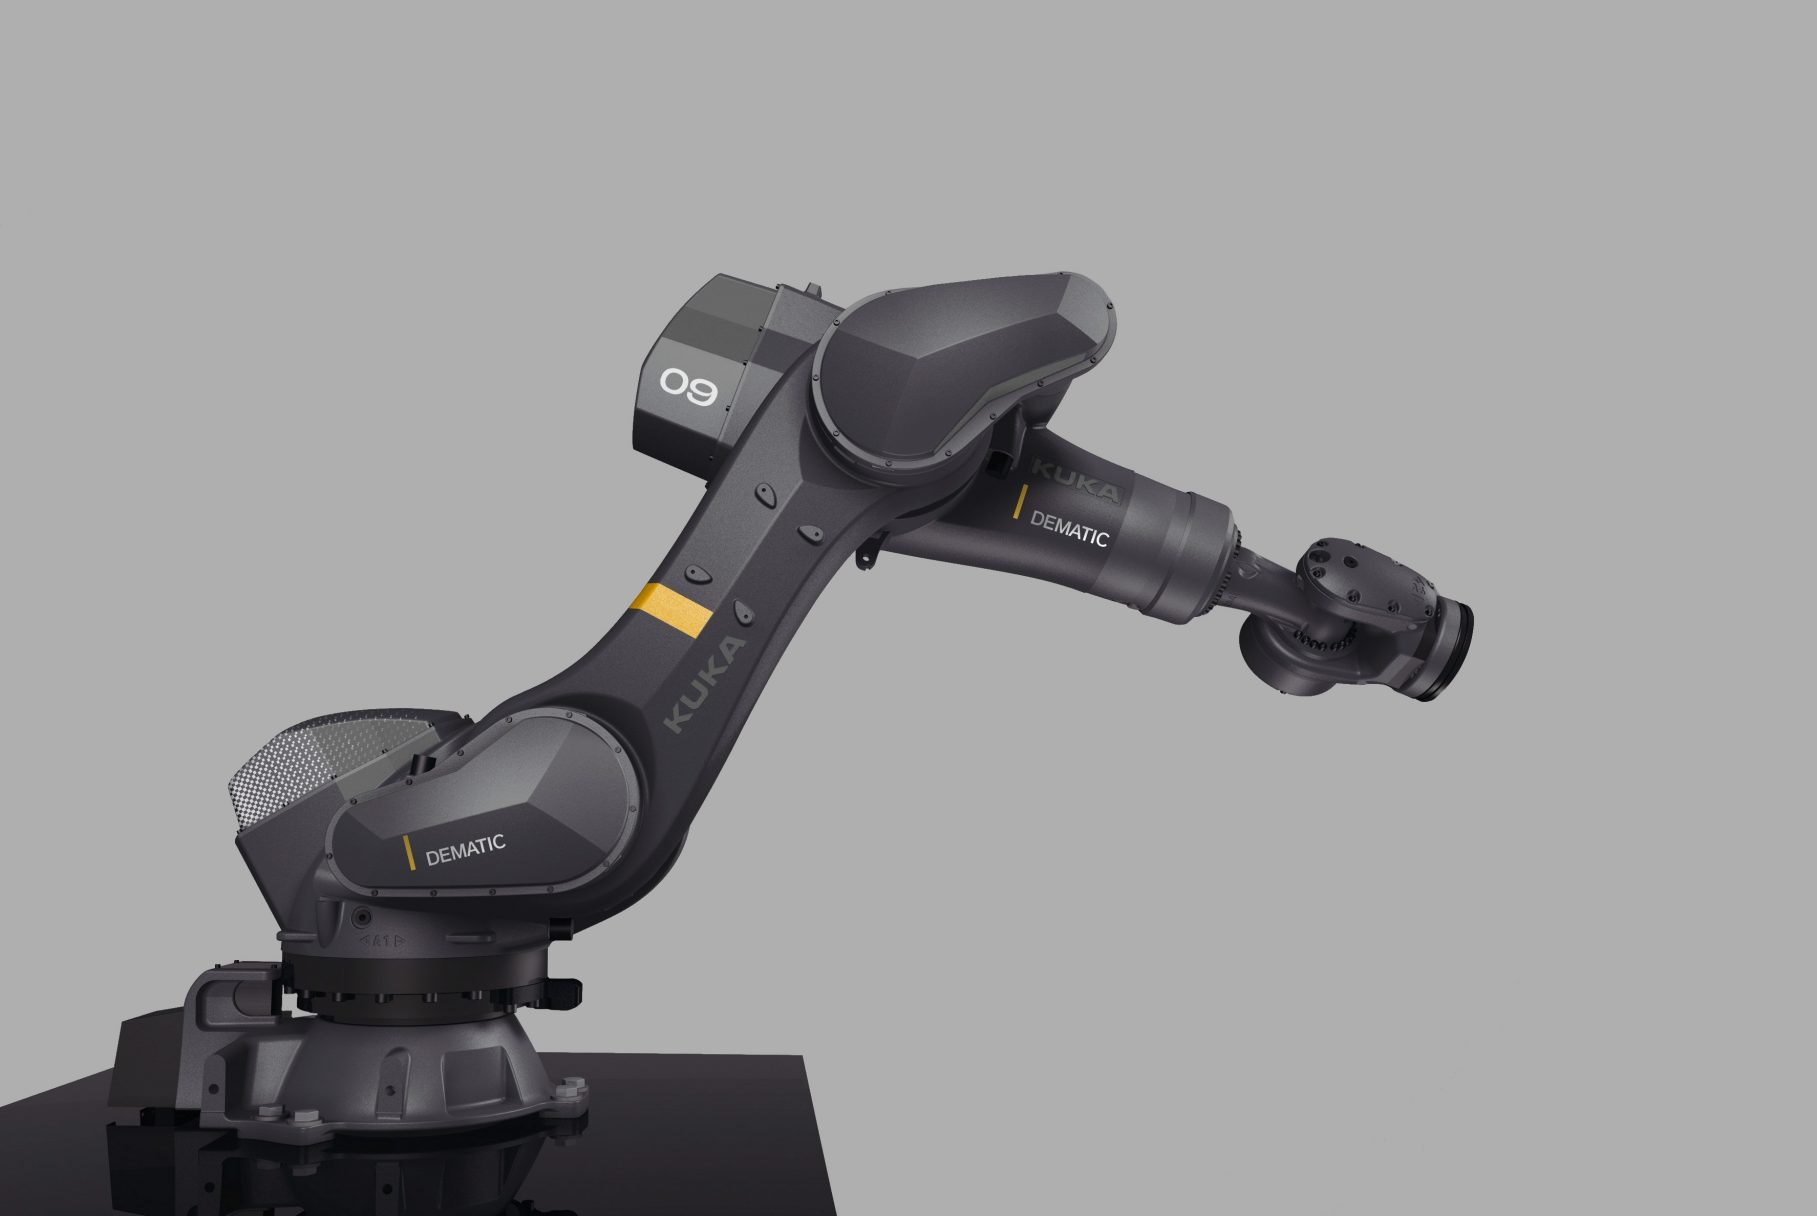 Dematic-Kuka-Robot-Arm-D-RASTER